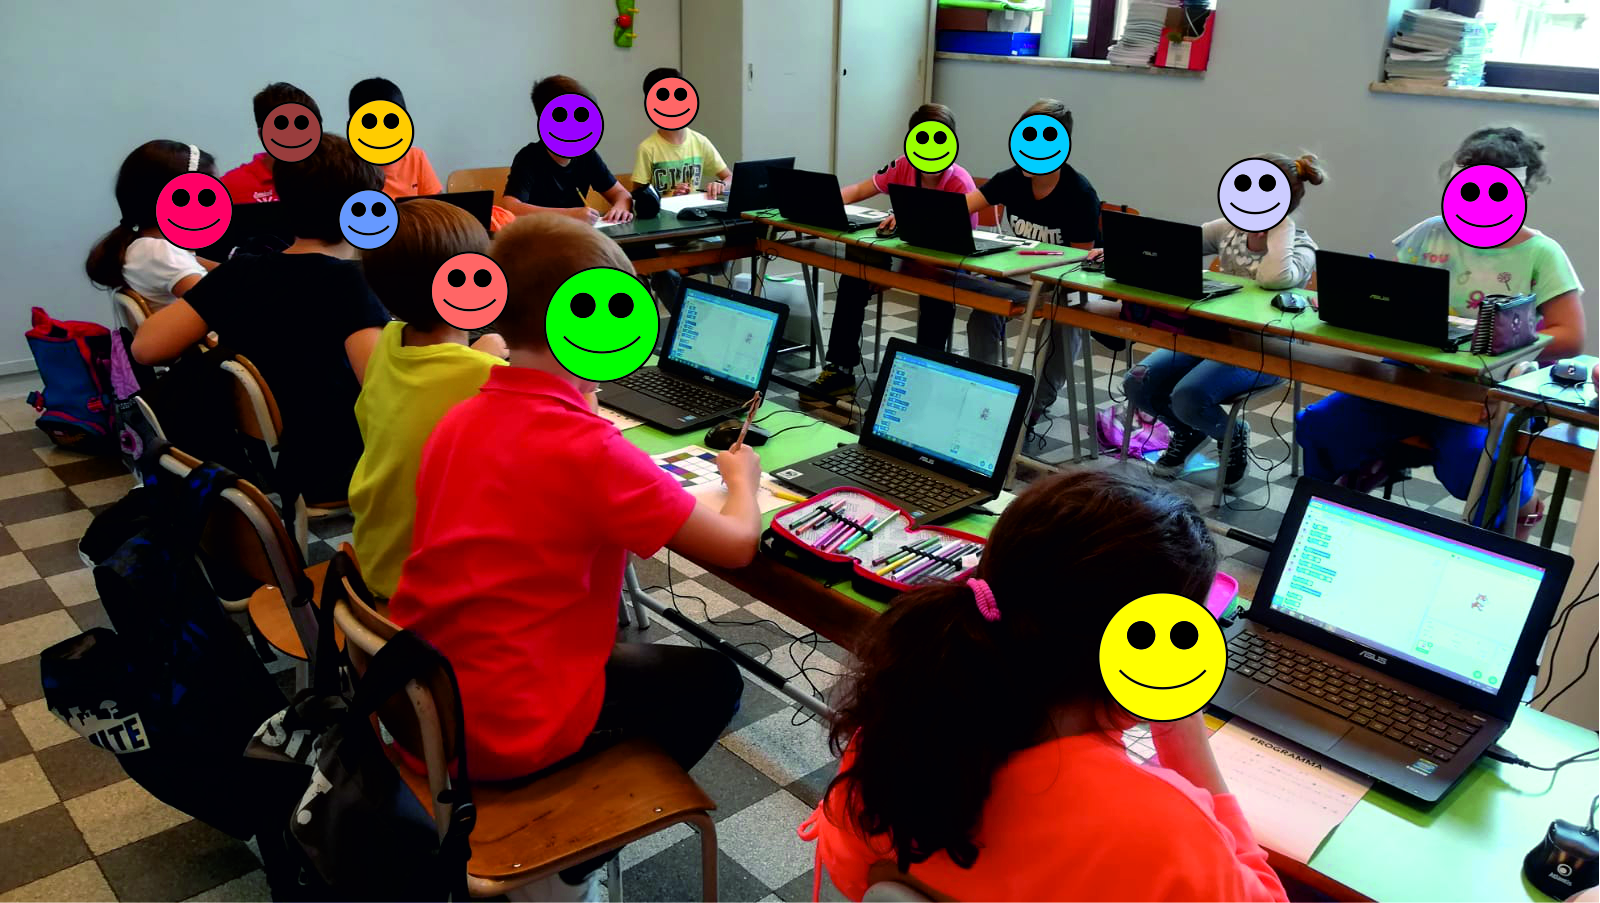 pon-fablab-palermo-scuola-coding-robotica-stampa3d-scratch